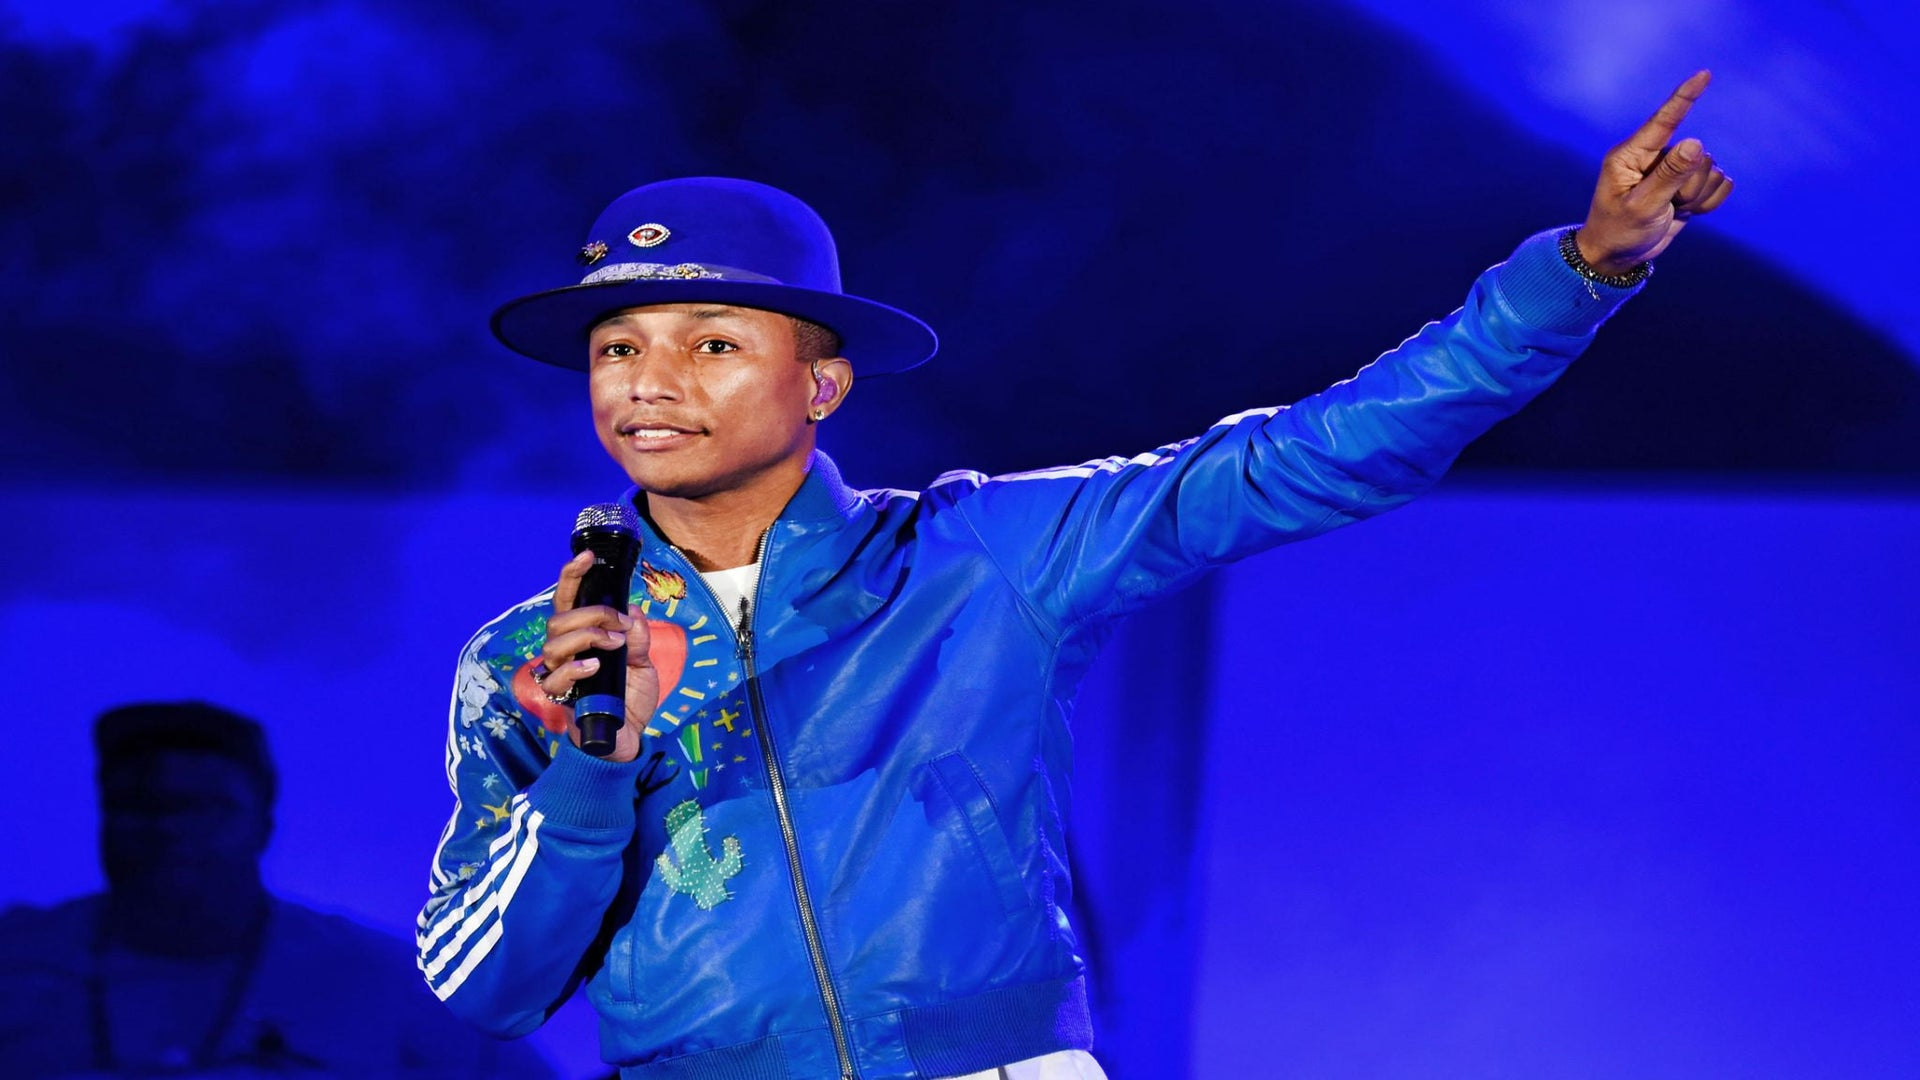 Grammy Watch: Beyoncé, Pharrell Williams, and Jhené Aiko Earn Nods